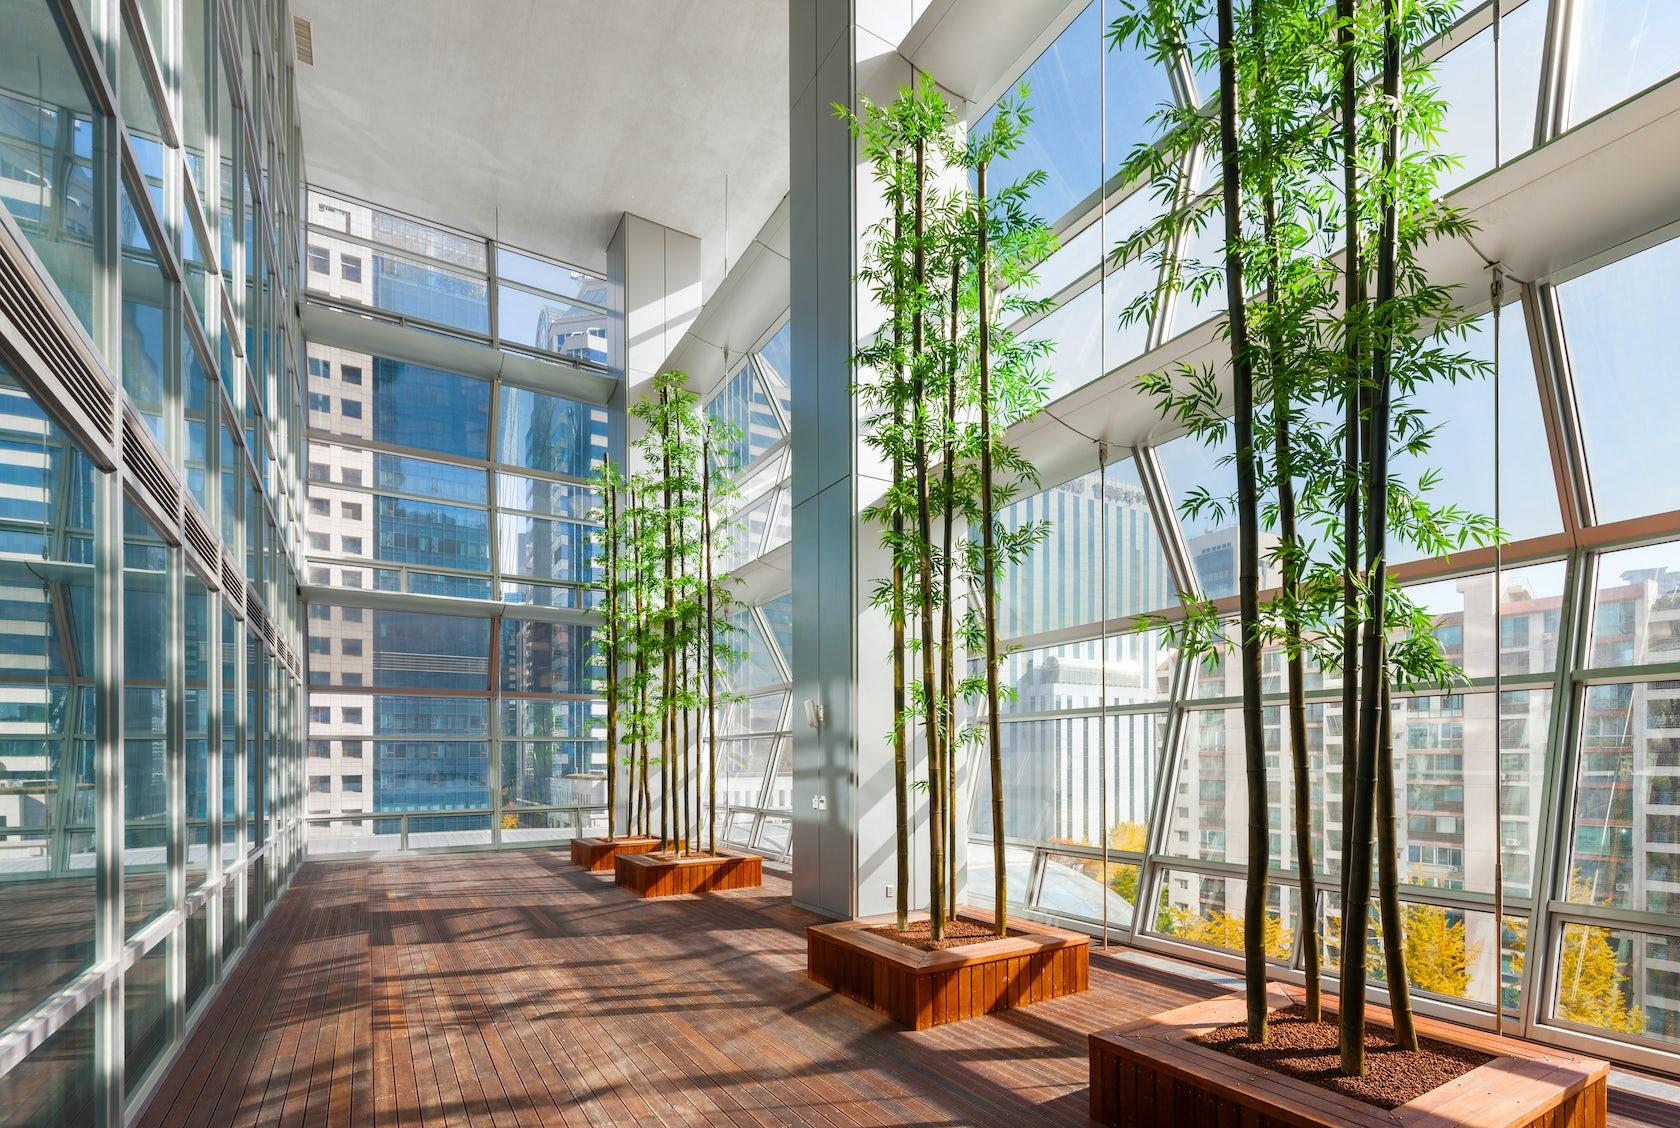 Federation of korean industries architizer for Atrium design and decoration